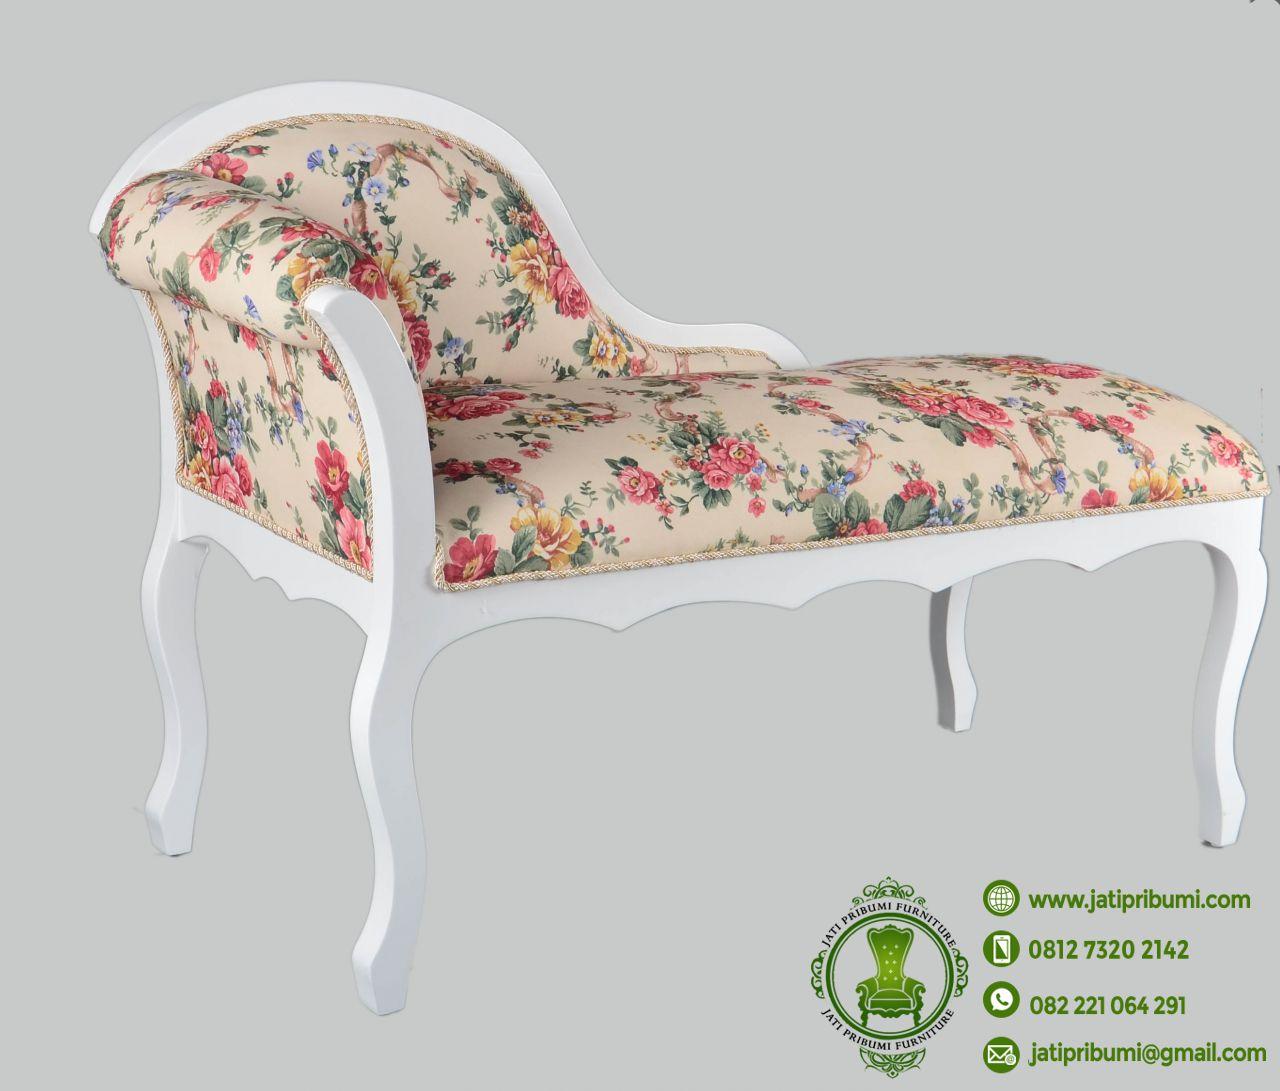 Desain Interior Furniture Jepara Kursi Shabby Chic Terpopuler